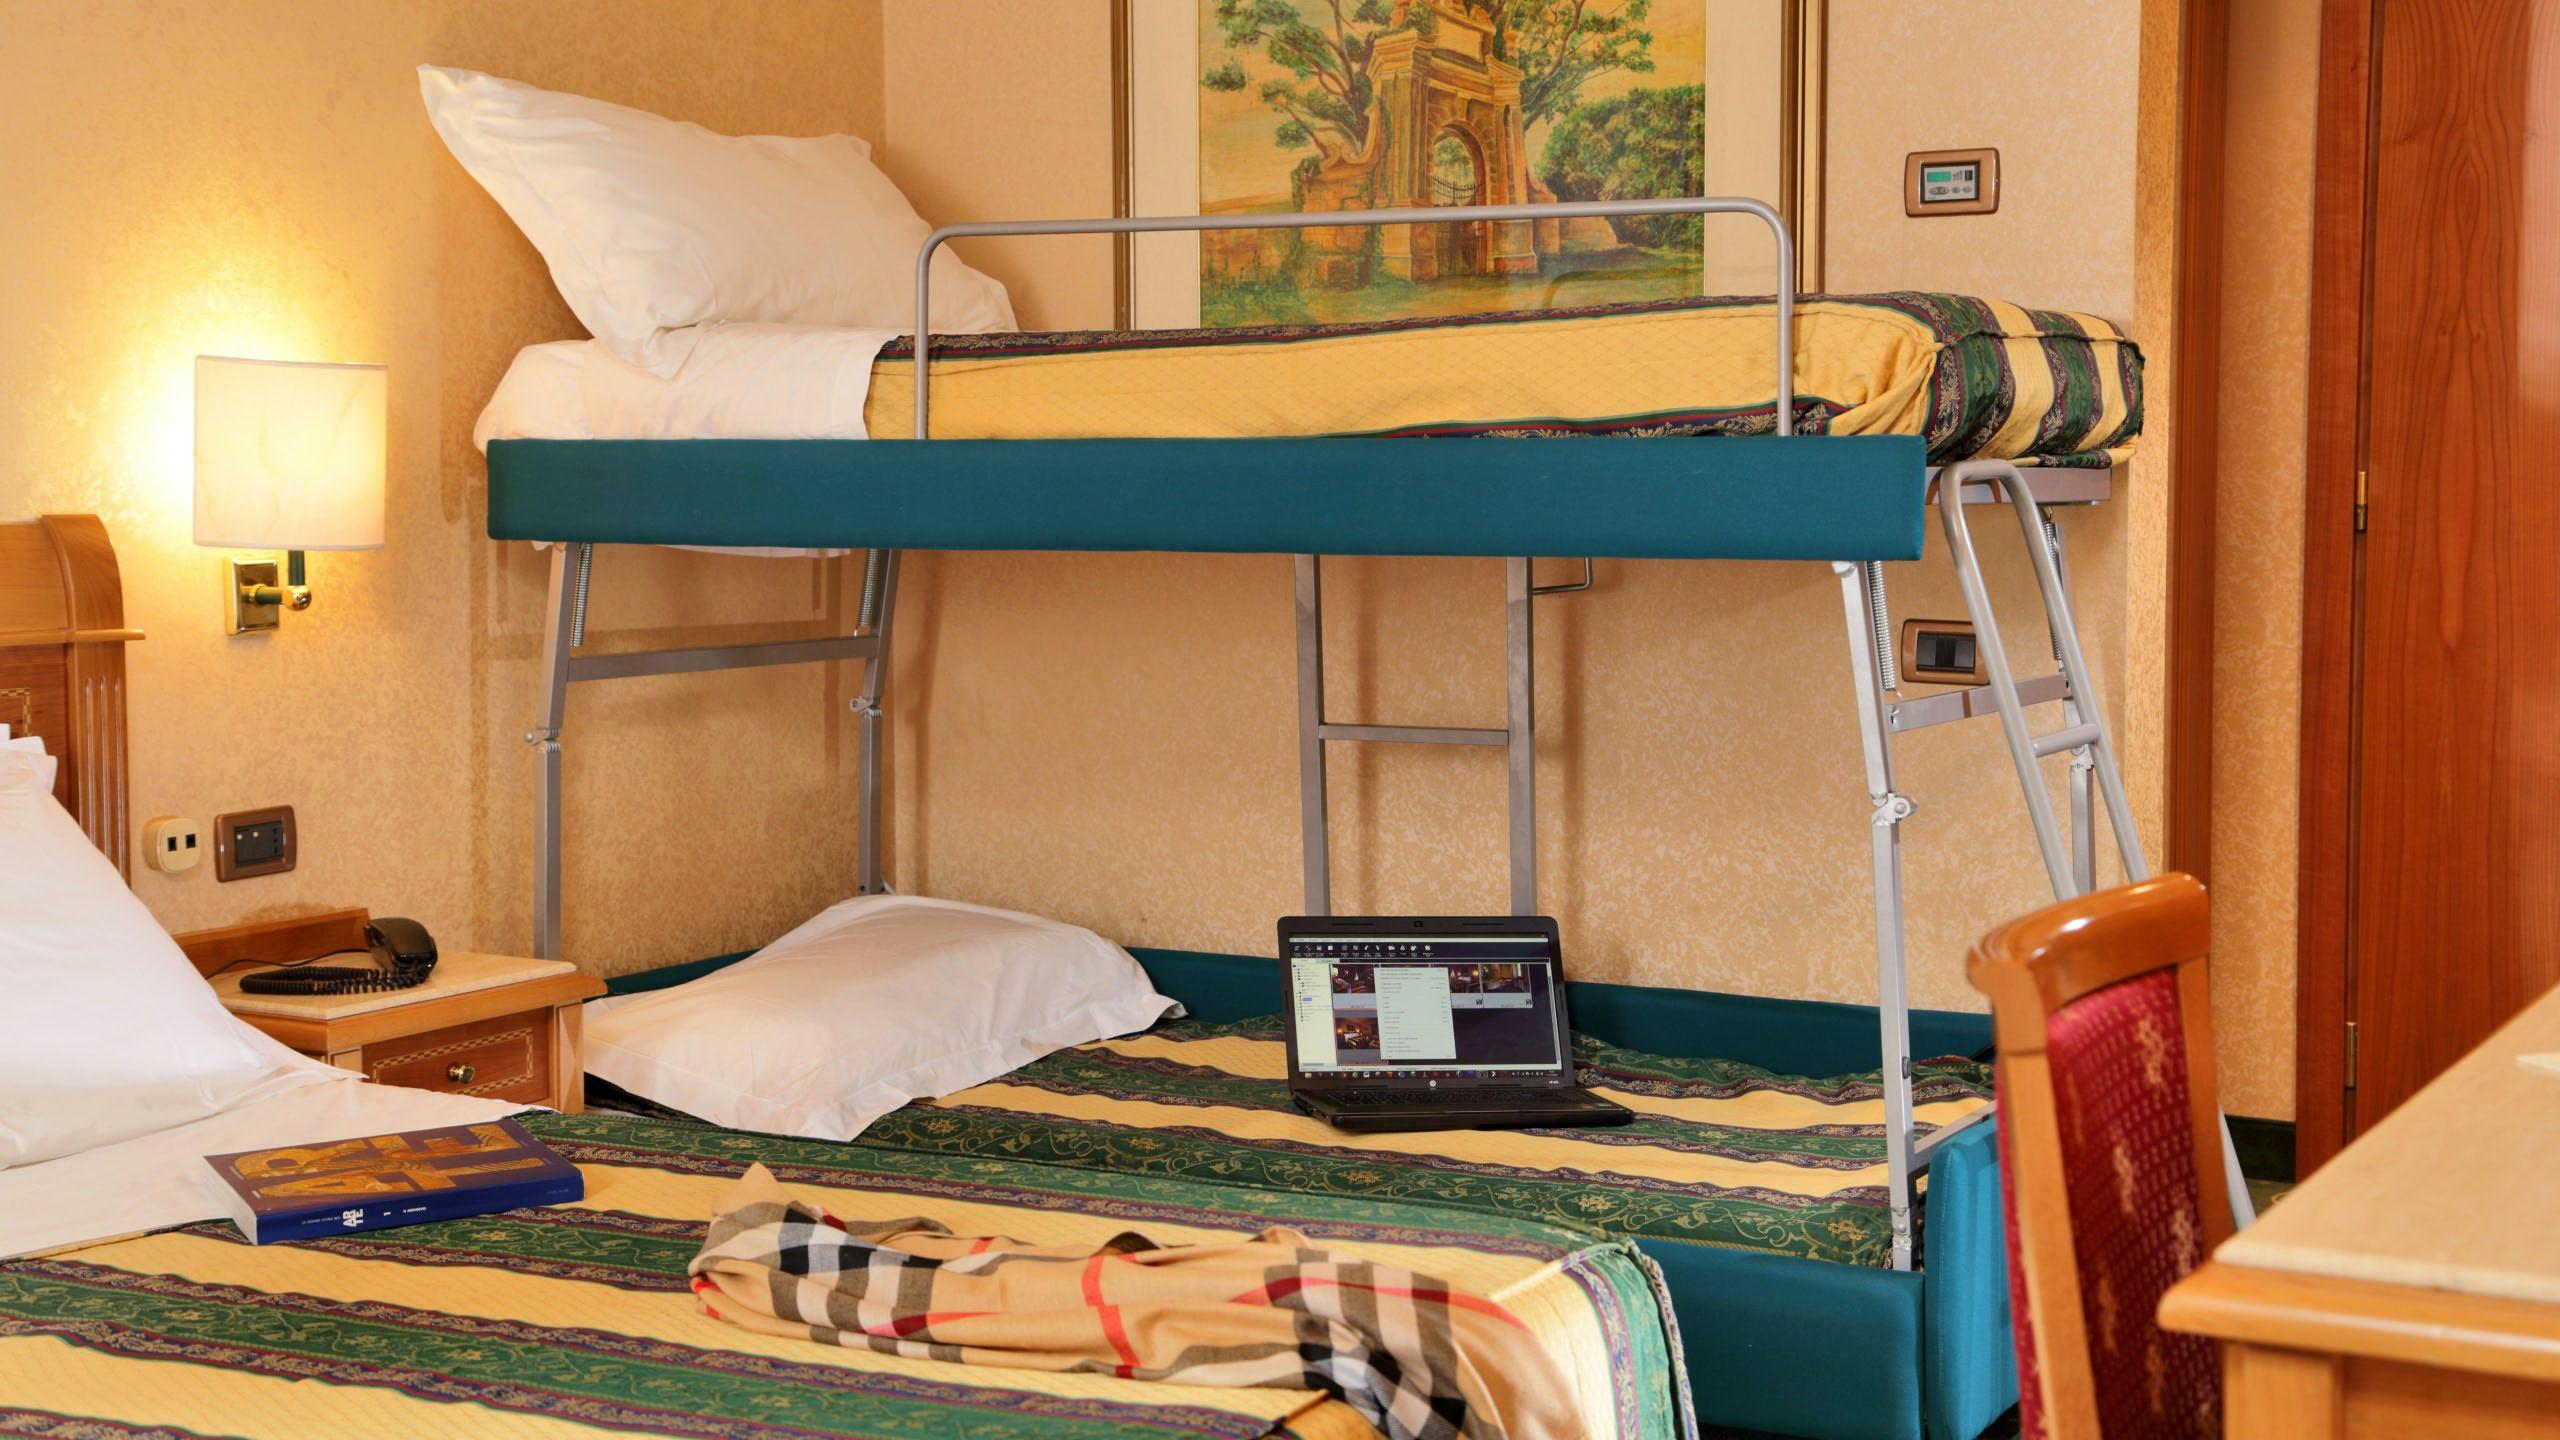 Hotel-Colonna-Frascati-camera-14